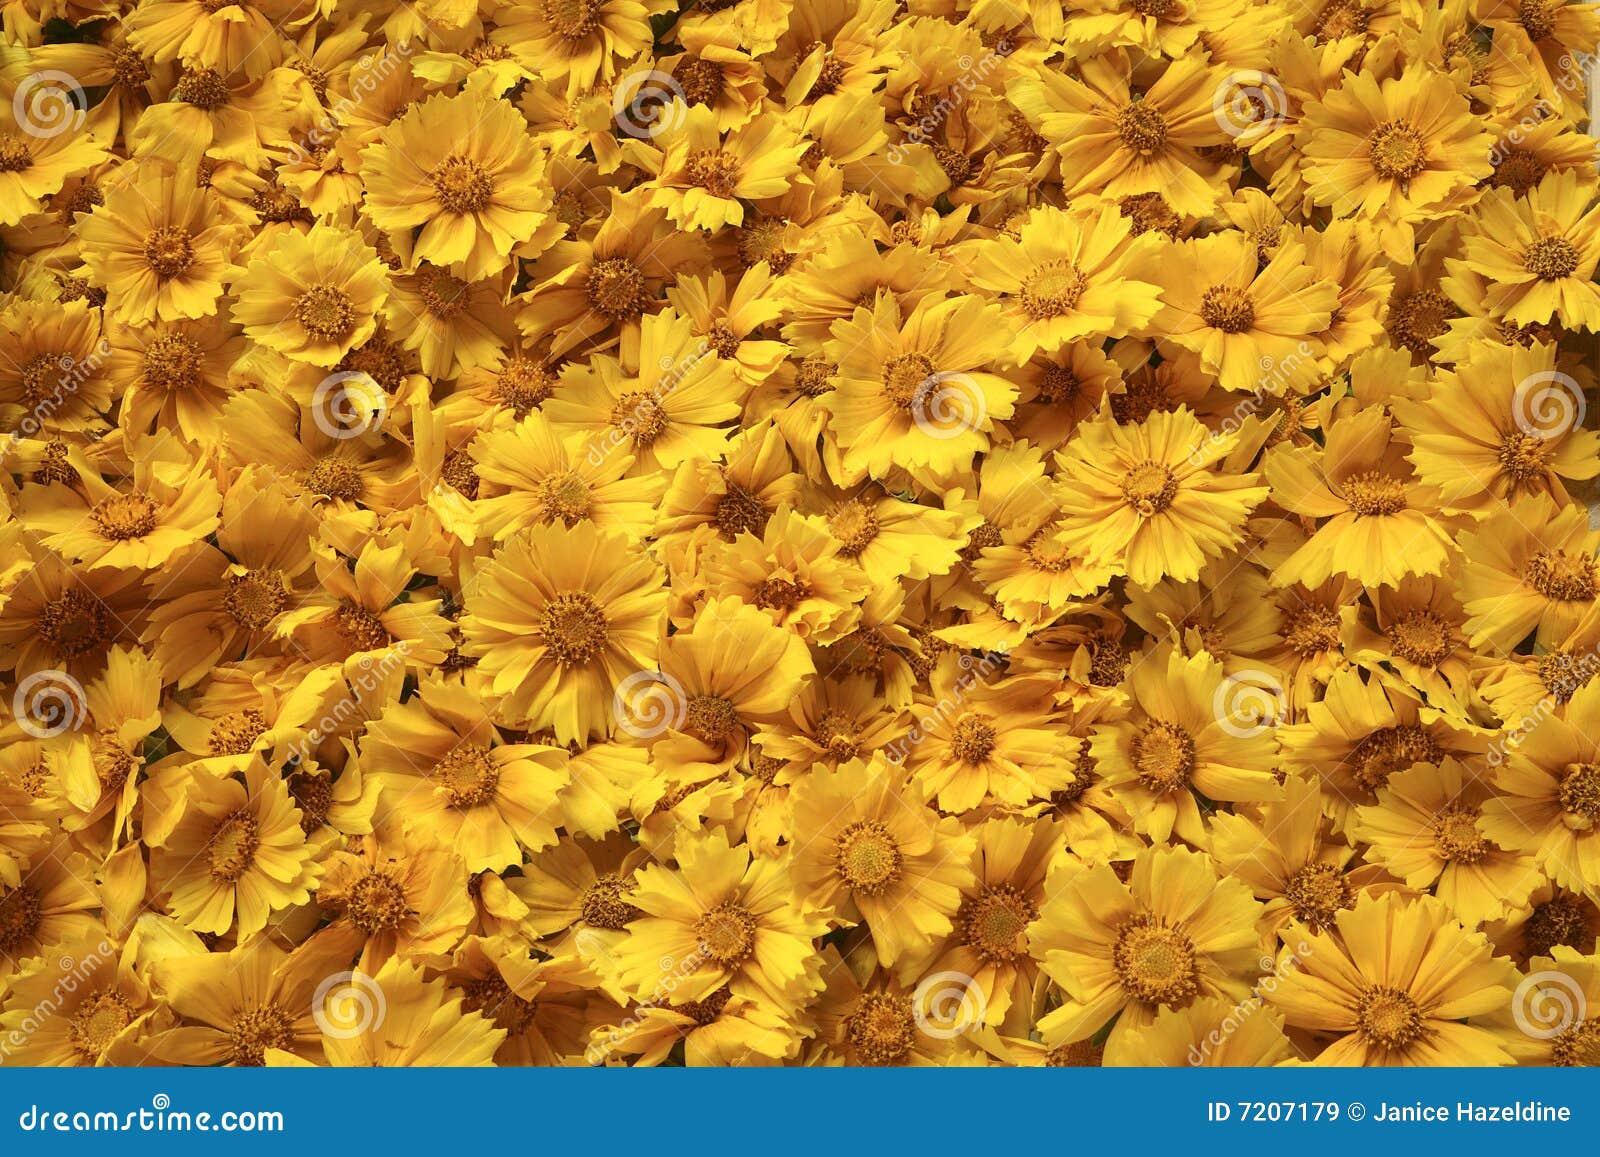 Golden yellow flowers background stock image image of tickseed golden yellow flowers background mightylinksfo